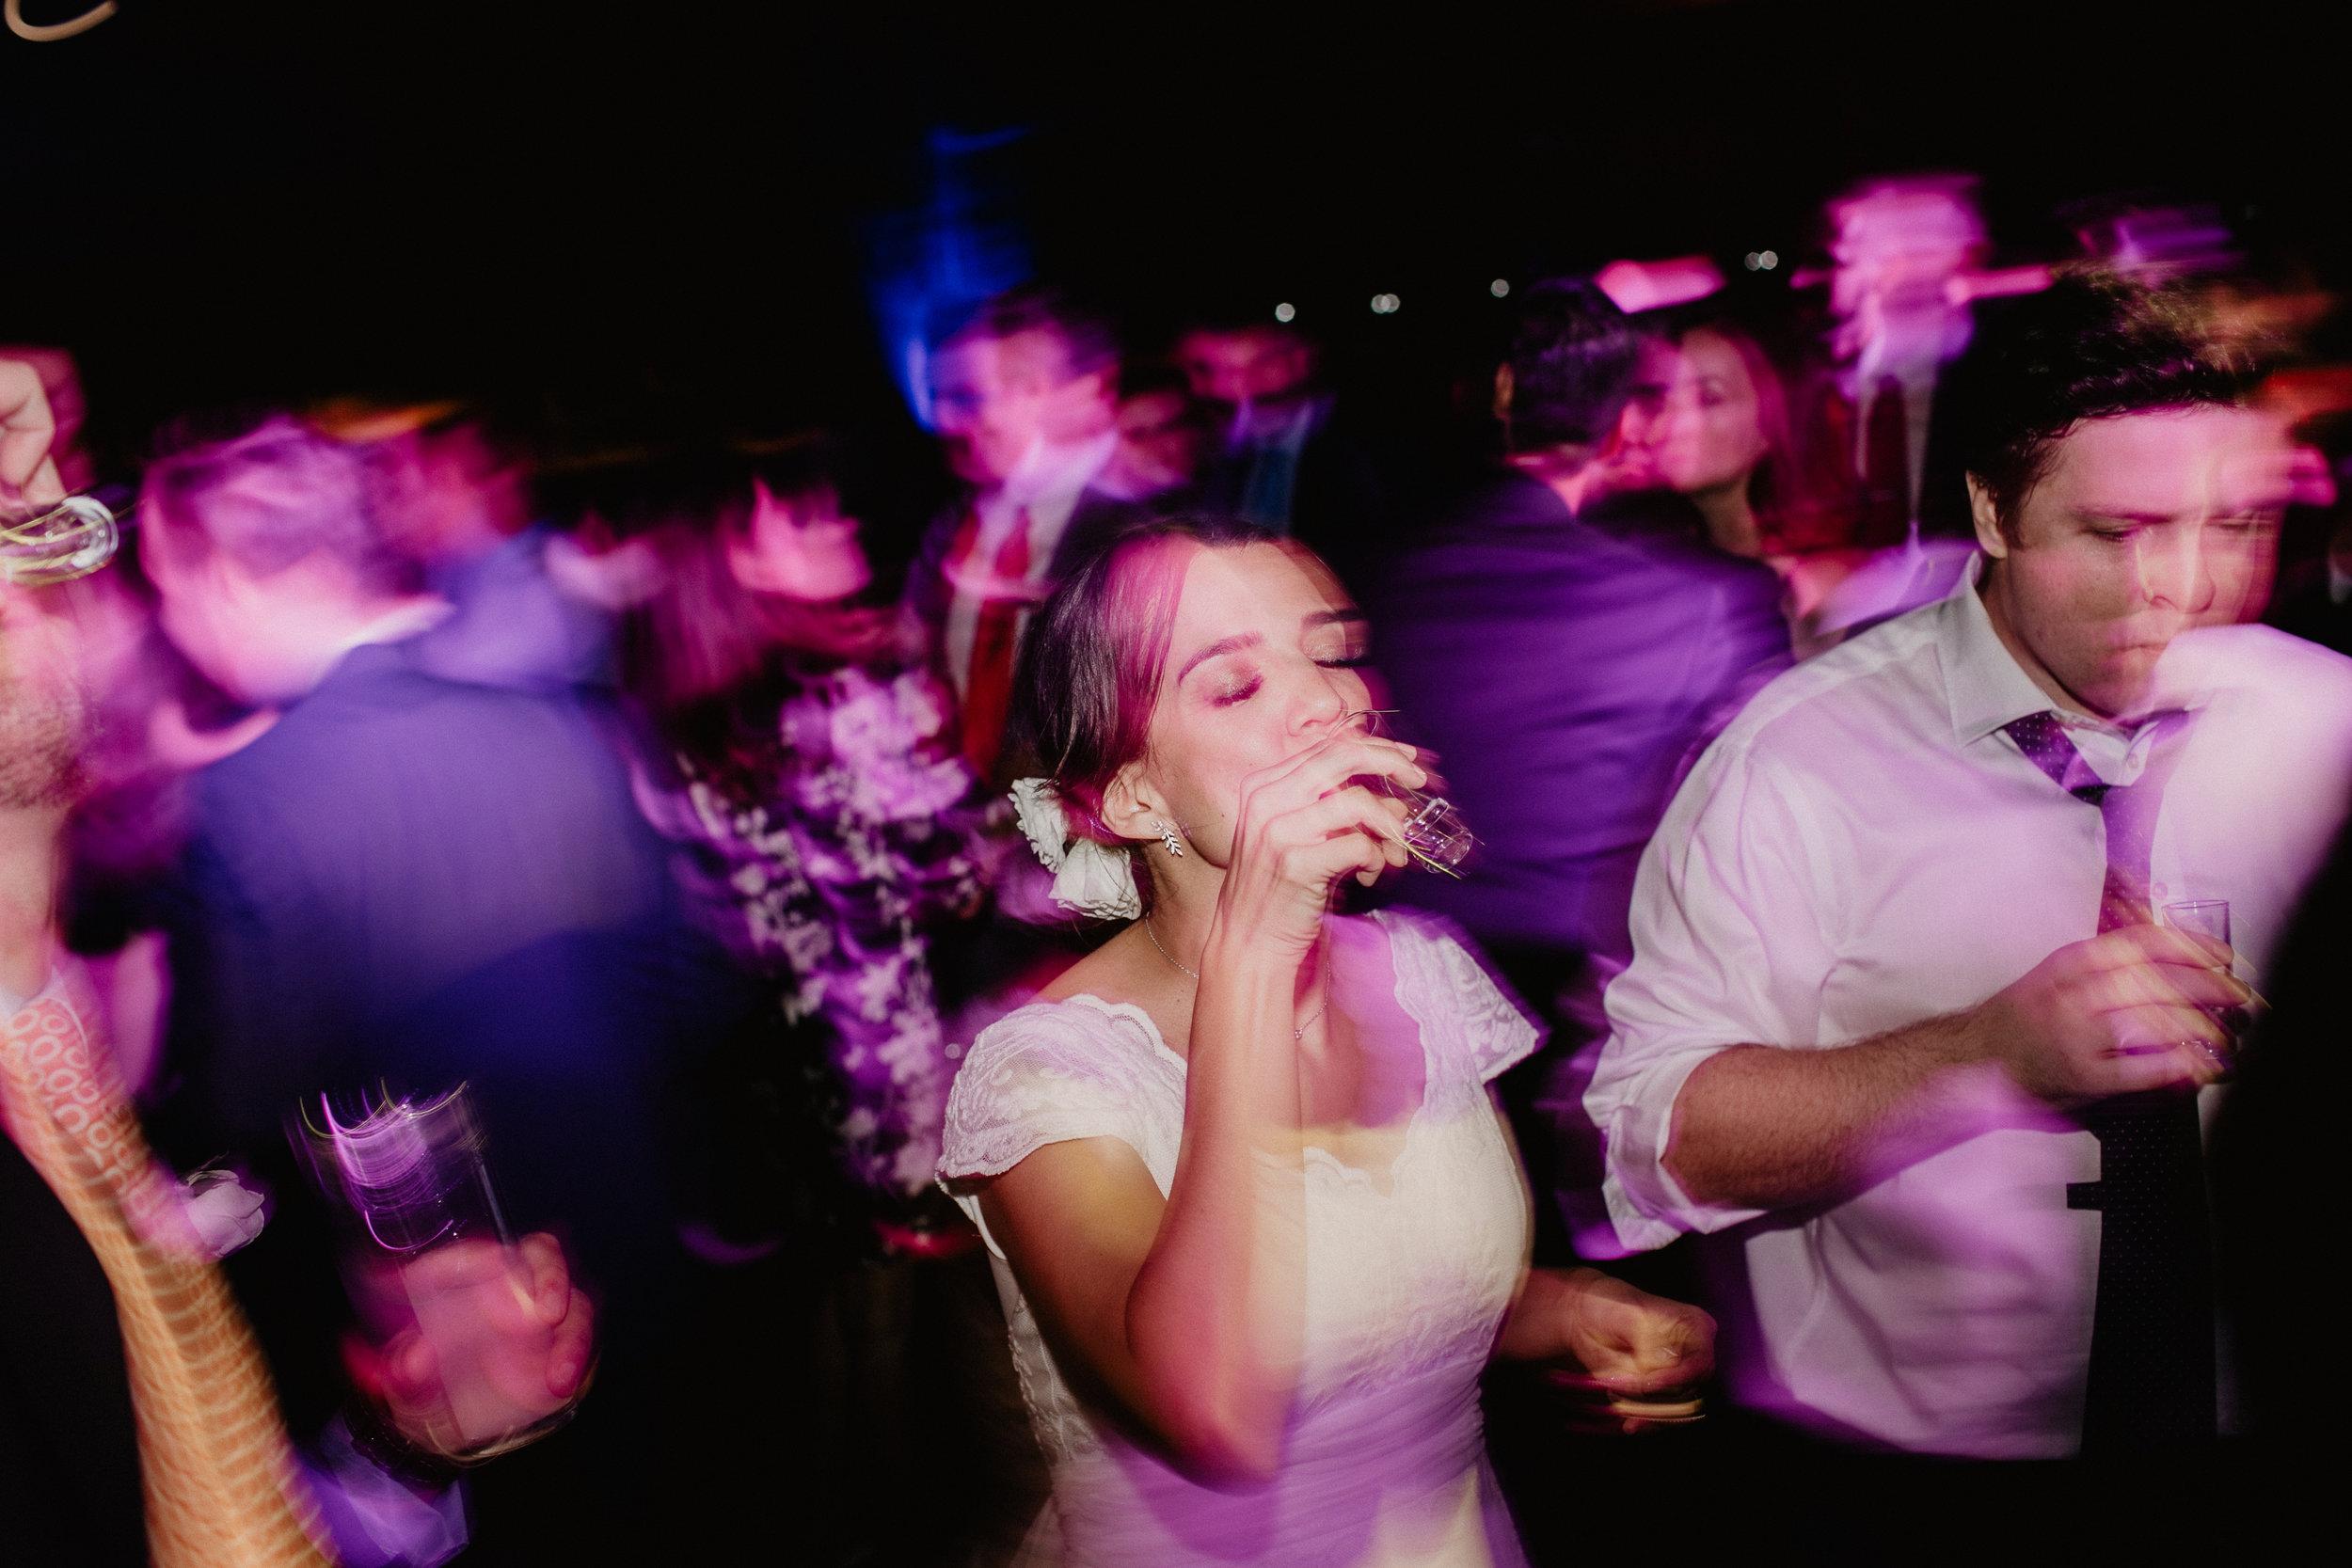 alfonso_flores_destination_wedding_photographer_pau_alonso_1244.JPG